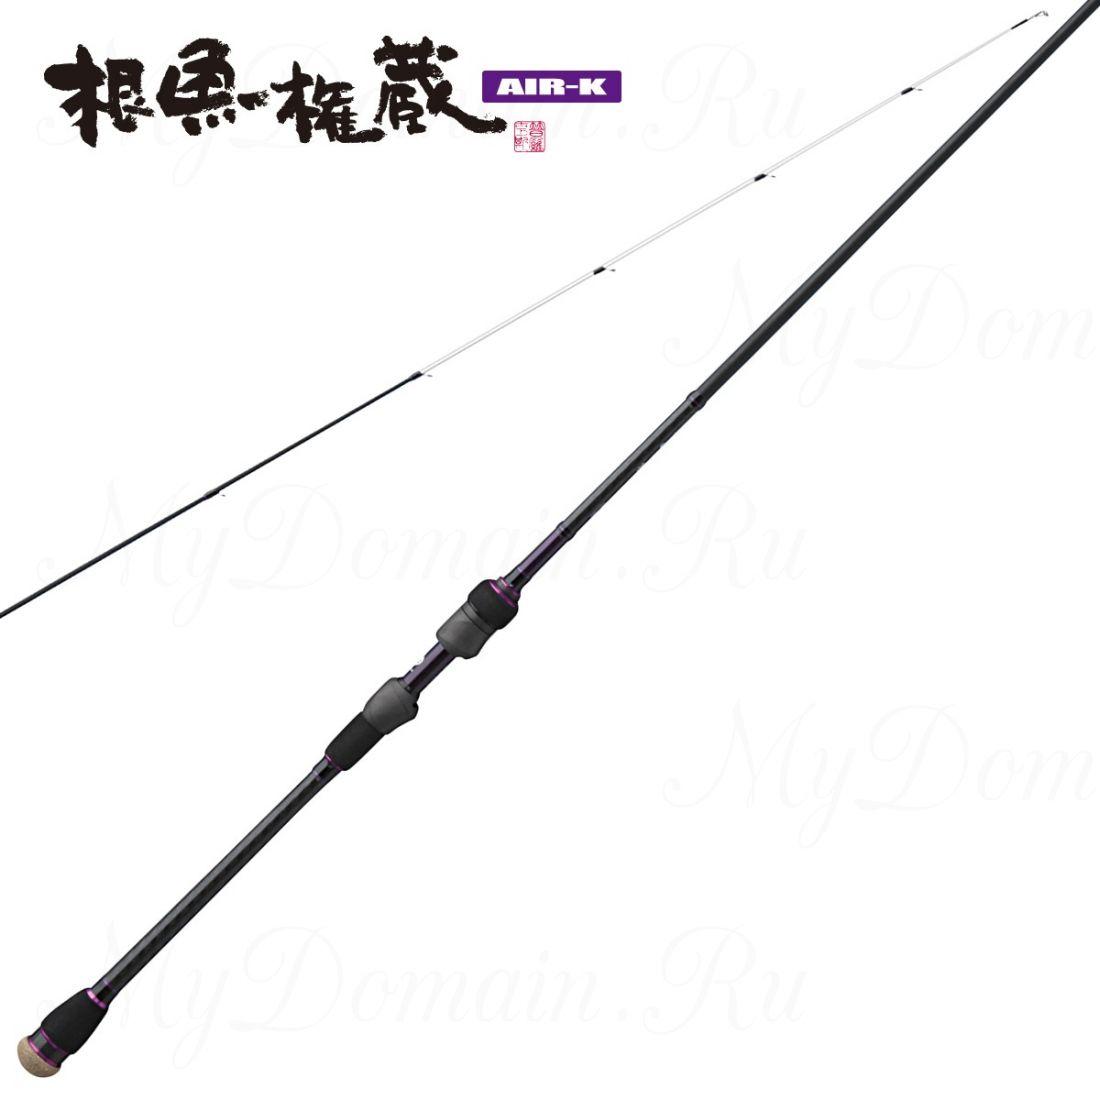 Спиннинг Prox Nezakana Gonzo AIR-K NGAK60EF 183 см, 2 секции, 0.6-5 гр, вес 94 гр, транспортная длина 120 см.